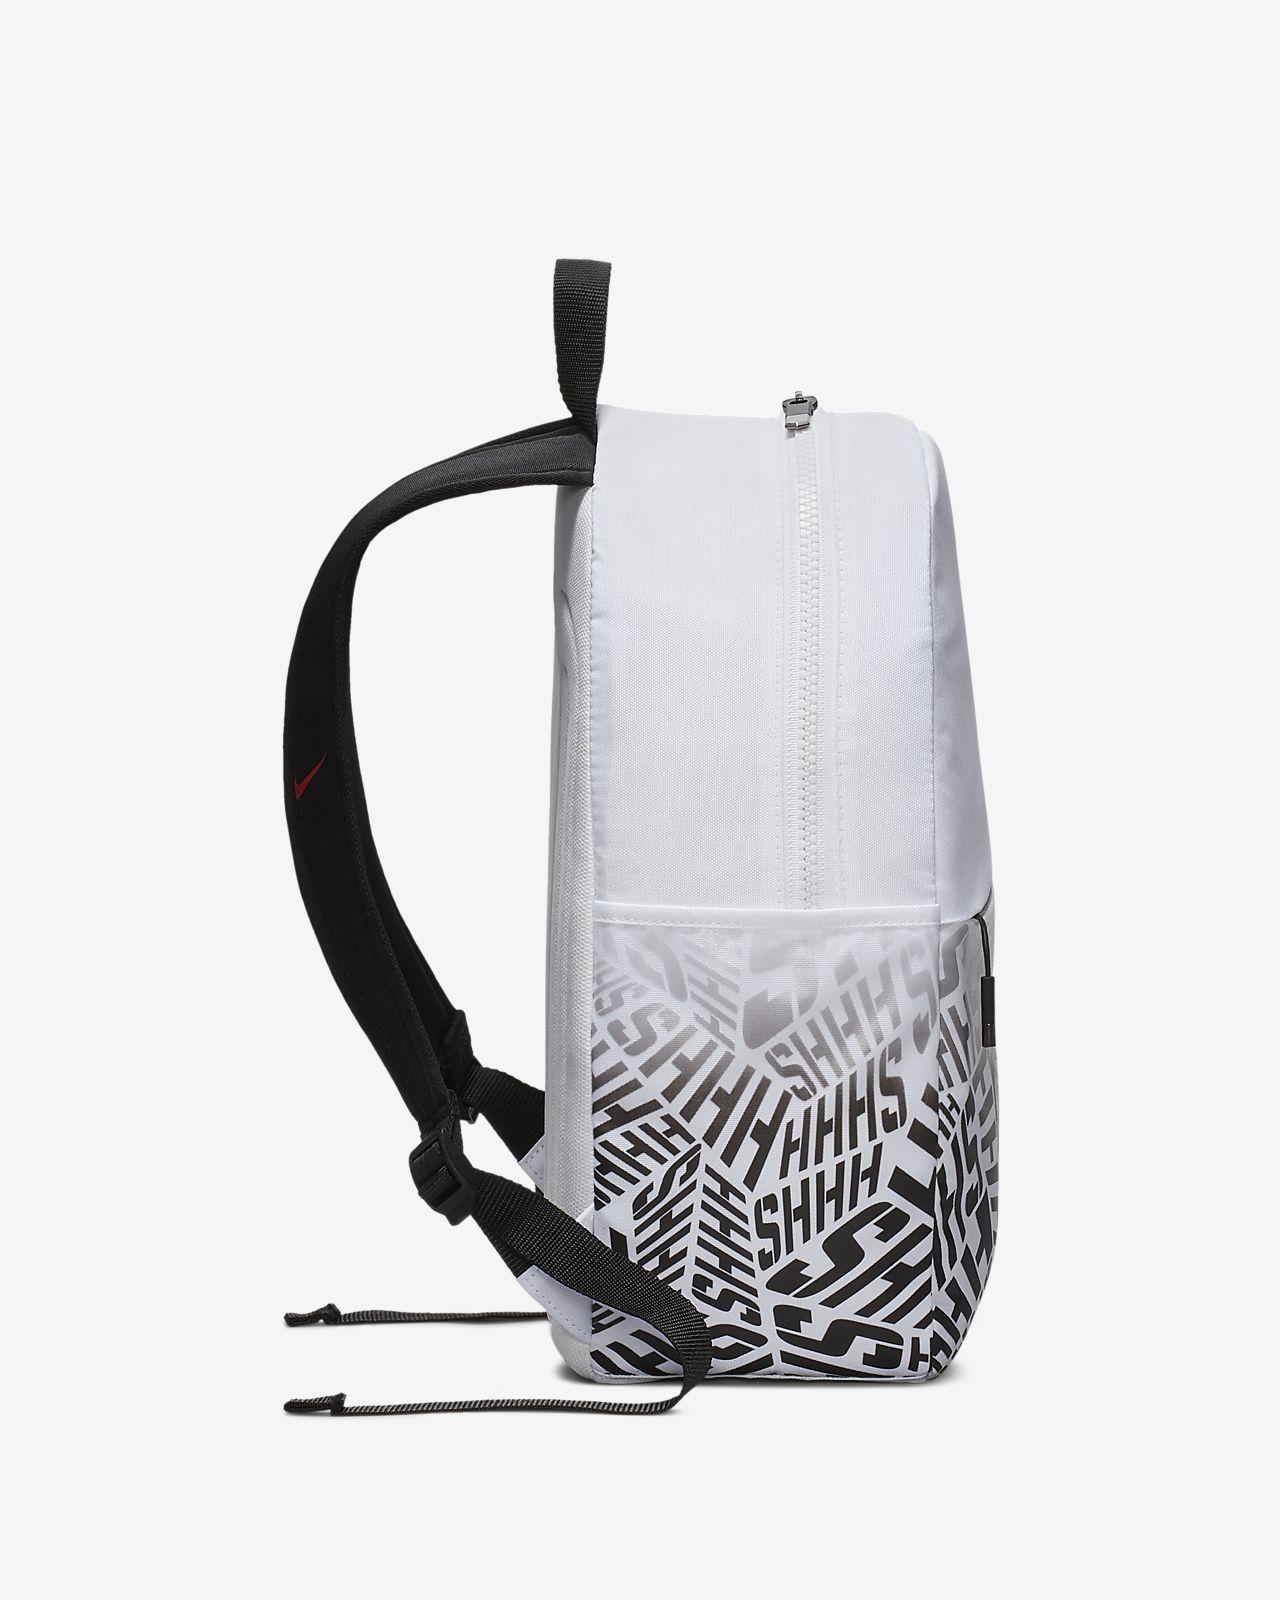 56c80cec8a Neymar Jr Kids  Football Backpack. Nike.com AU